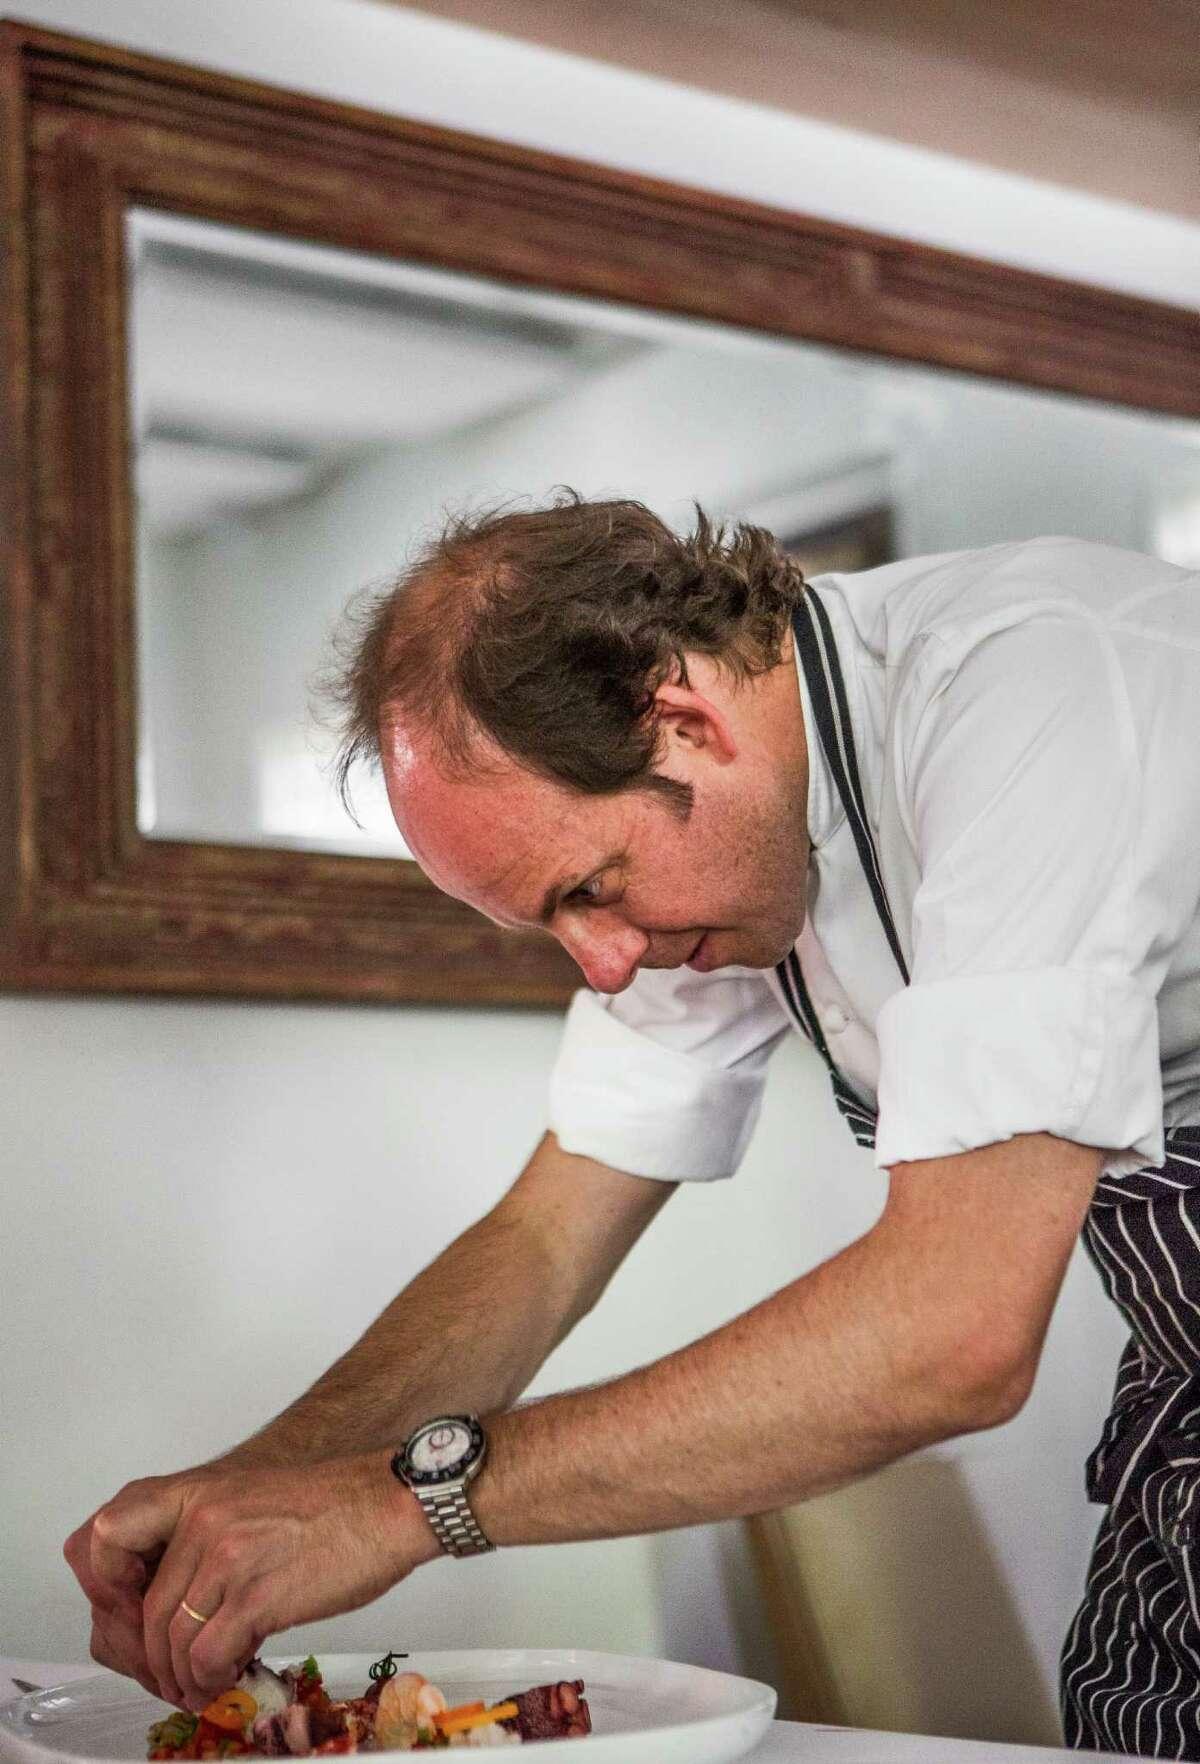 BCN Taste & Tradition chef Luis Roger